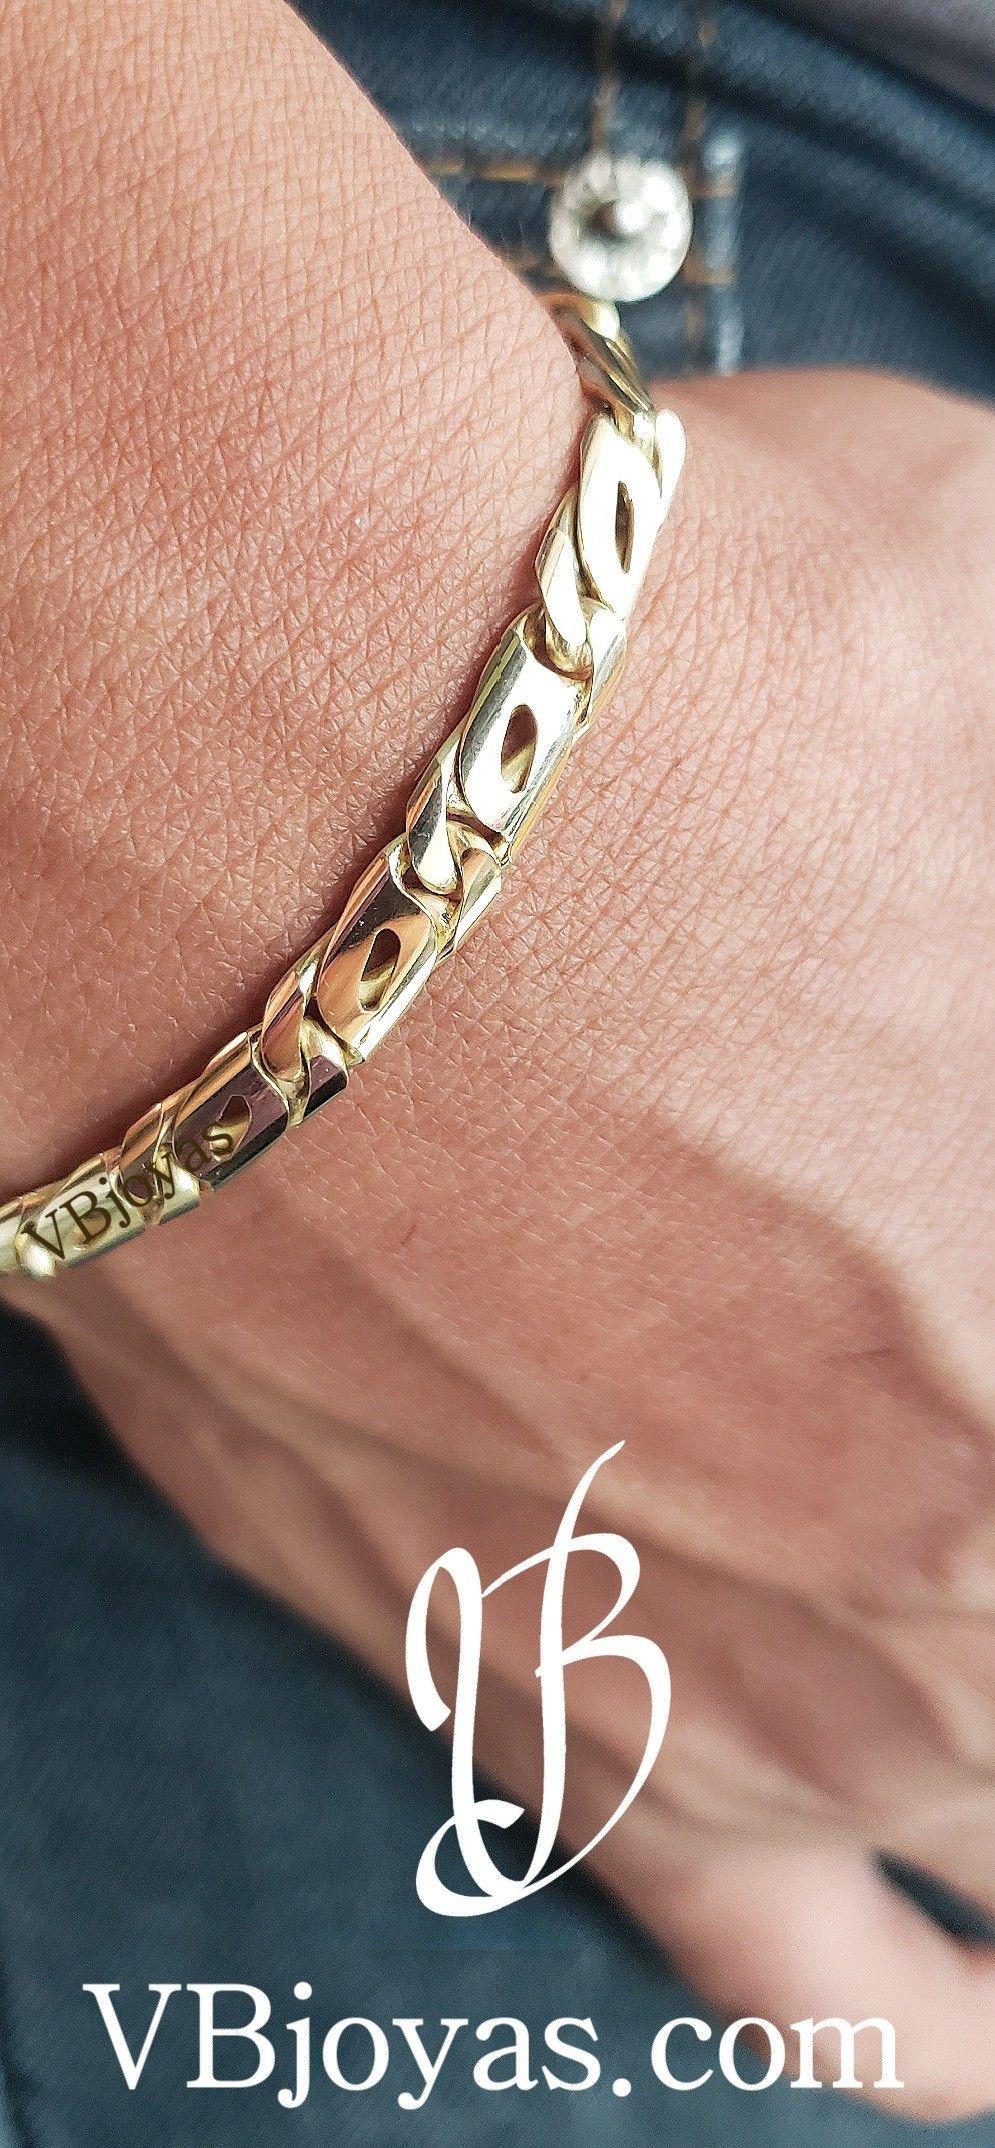 Men S Bracelet Vbjoyas Ecuador Pulsera De Oro Hombre Pulsera Oro Hombre Esclava De Oro Hombre